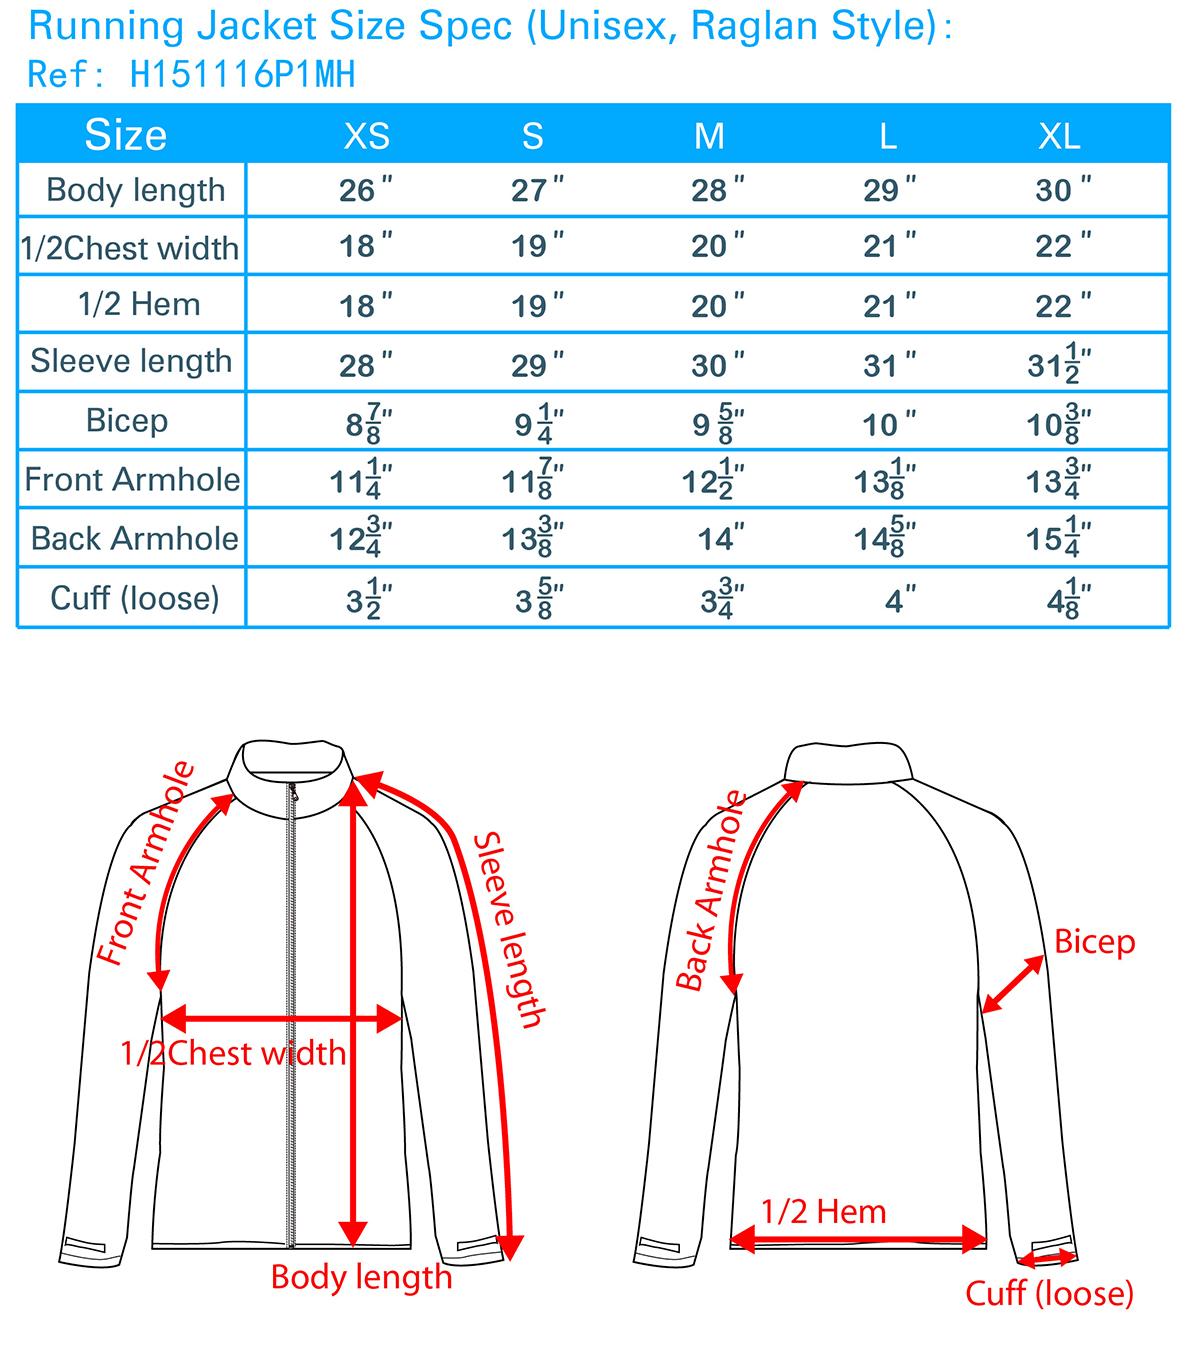 Running Jacket Size Spec(Unisex,Raglan Style)